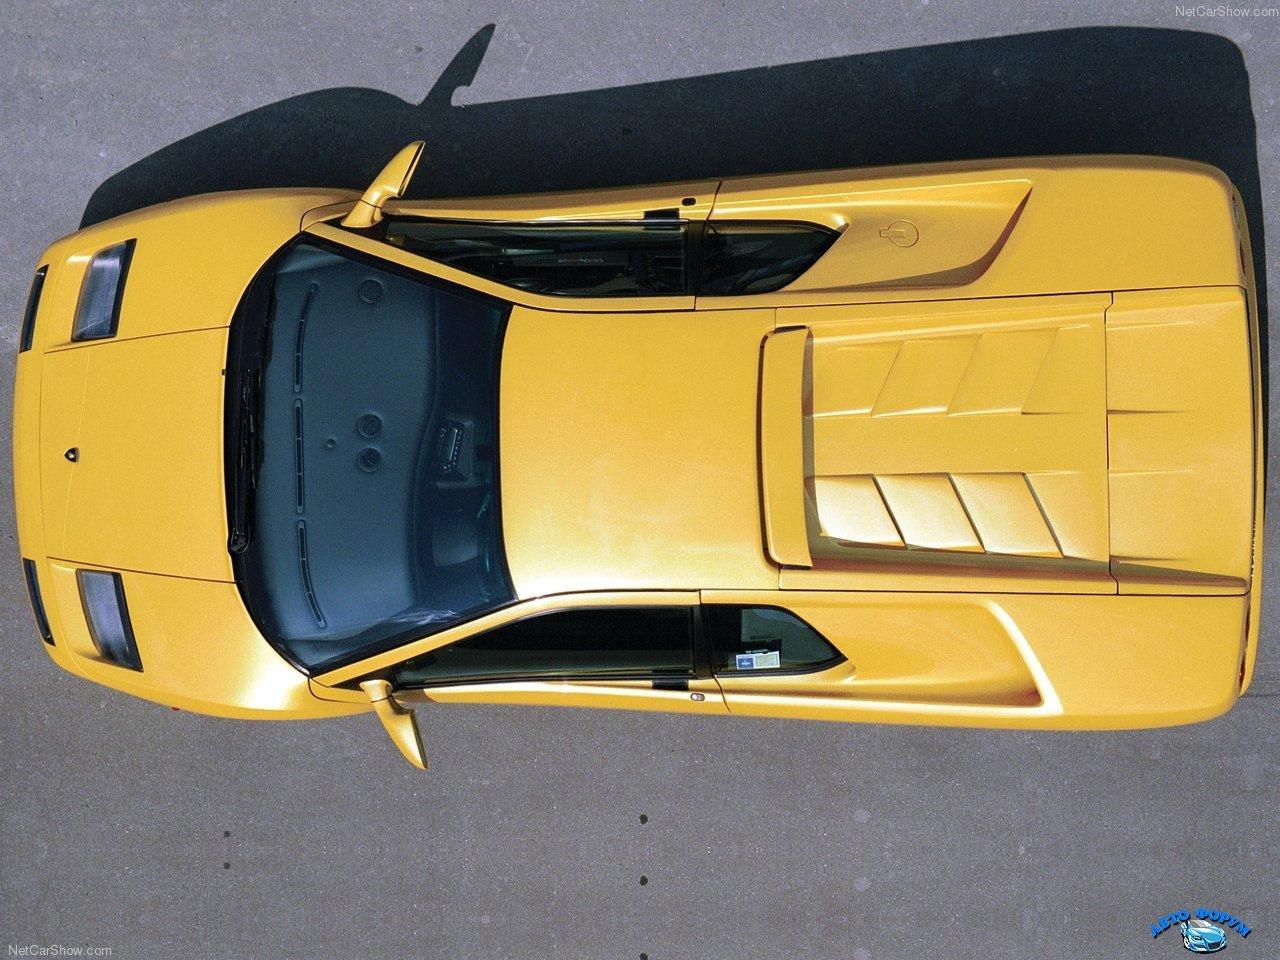 Lamborghini-Diablo_Iota_1995_1280x960_wallpaper_06.jpg